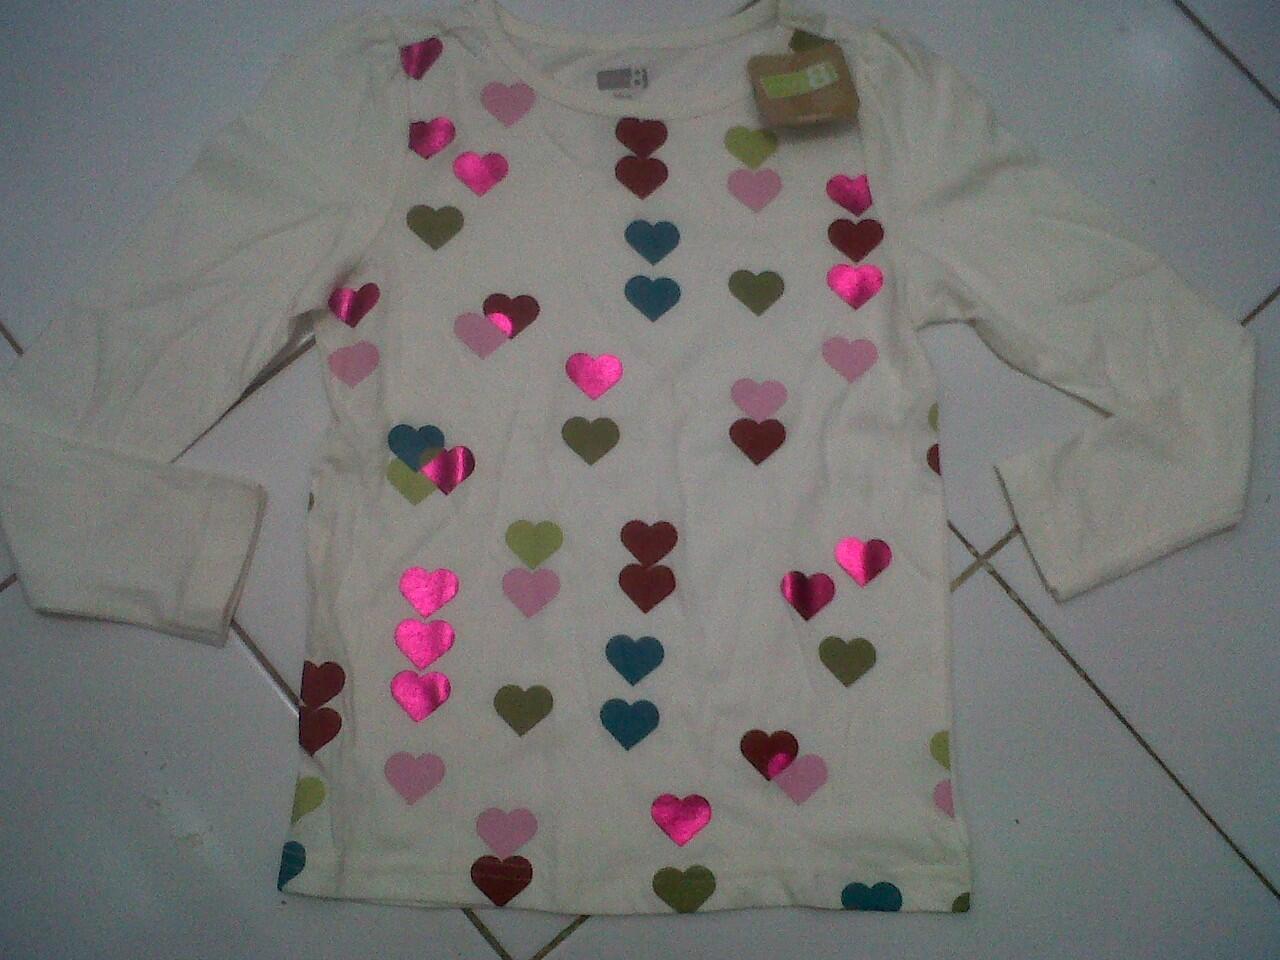 all about baby n chiLd.. gRosiR baju anak sisa export.. new n bRanded.. cekidoT..